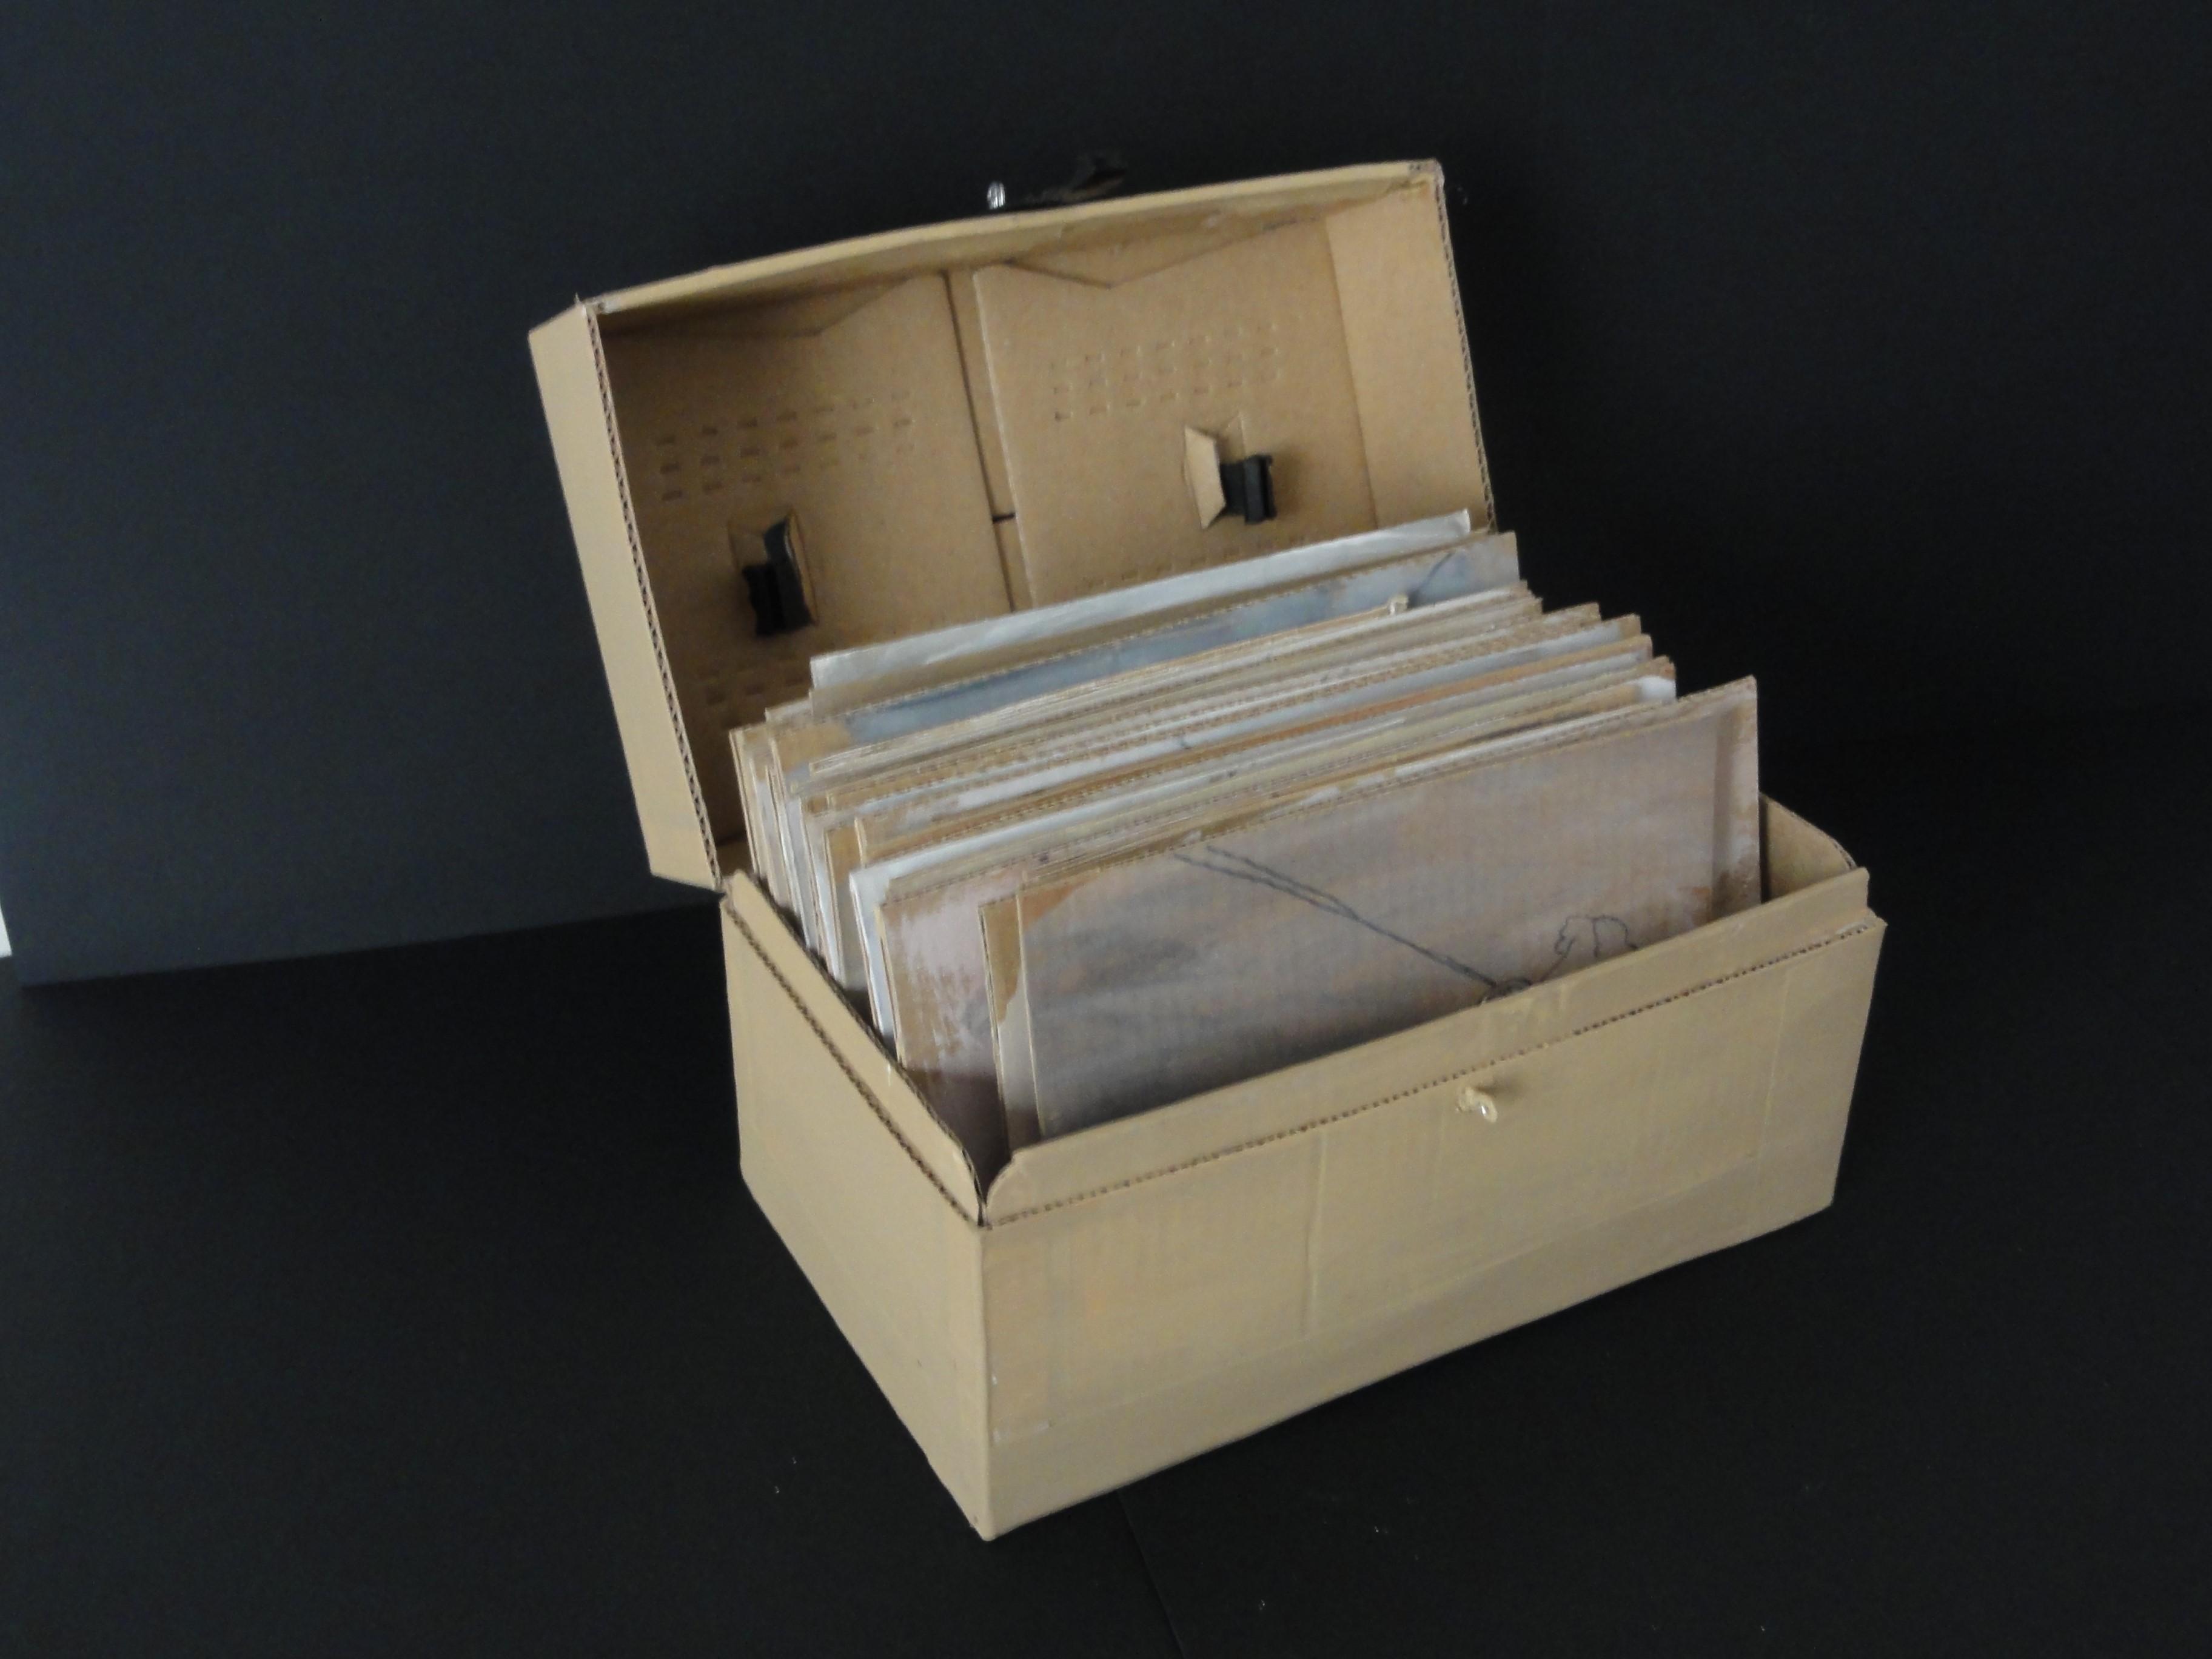 Box offenjpg